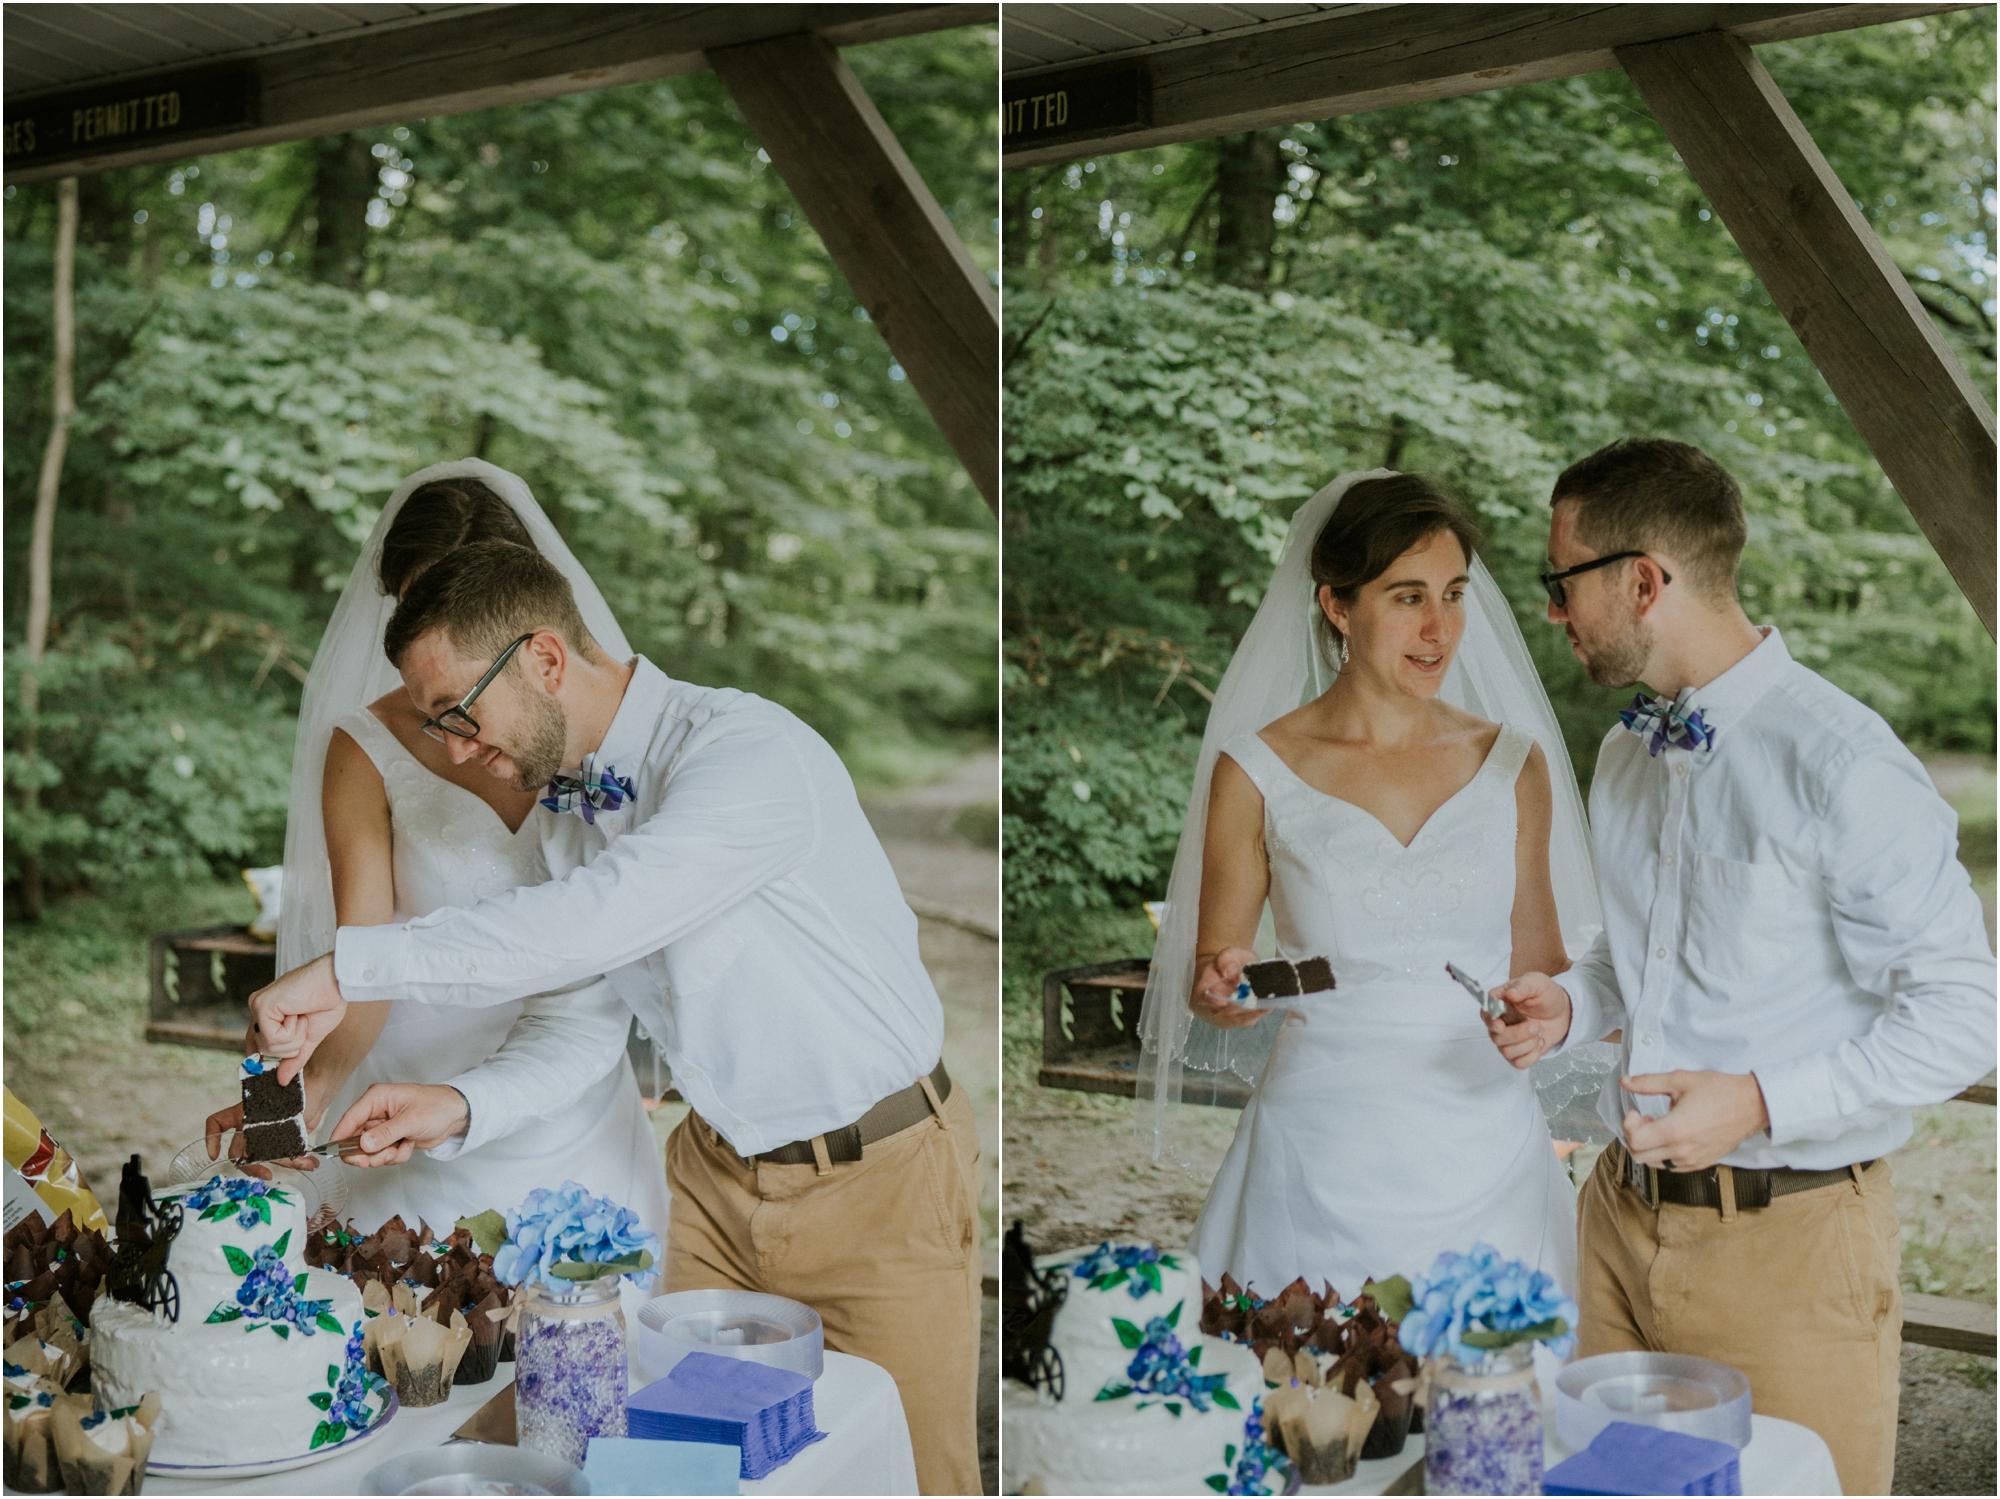 sugar-hollow-park-bristol-virginia-wedding-intimate-woodsy-black-forest-ceremony-adventurous-couple_0109.jpg